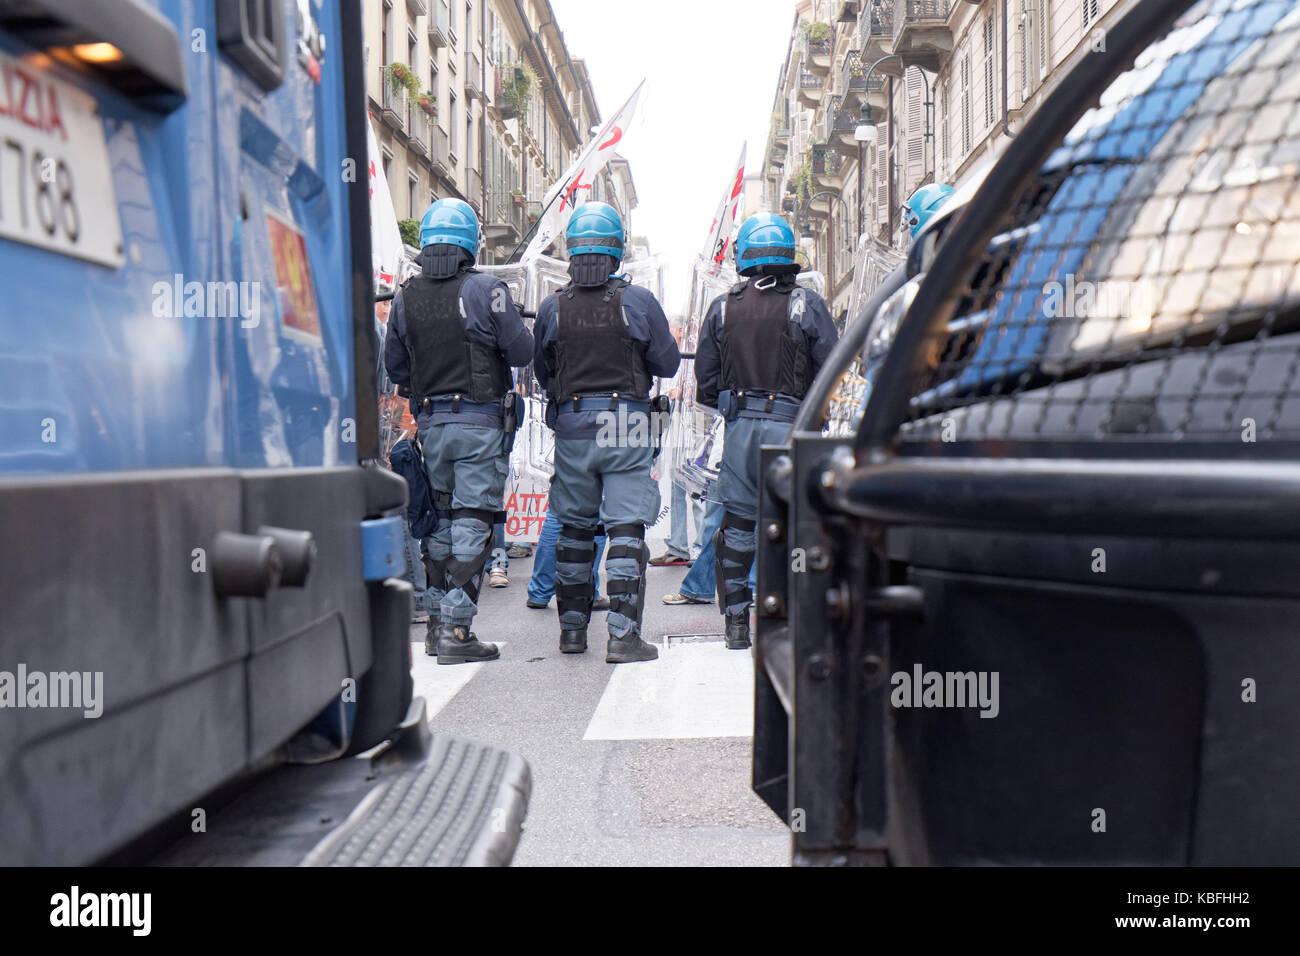 Torino, Italy. 29th September 2017. Riot Police blocking 'No TAV' (No-HSR) demonstrators during a student rally Stock Photo